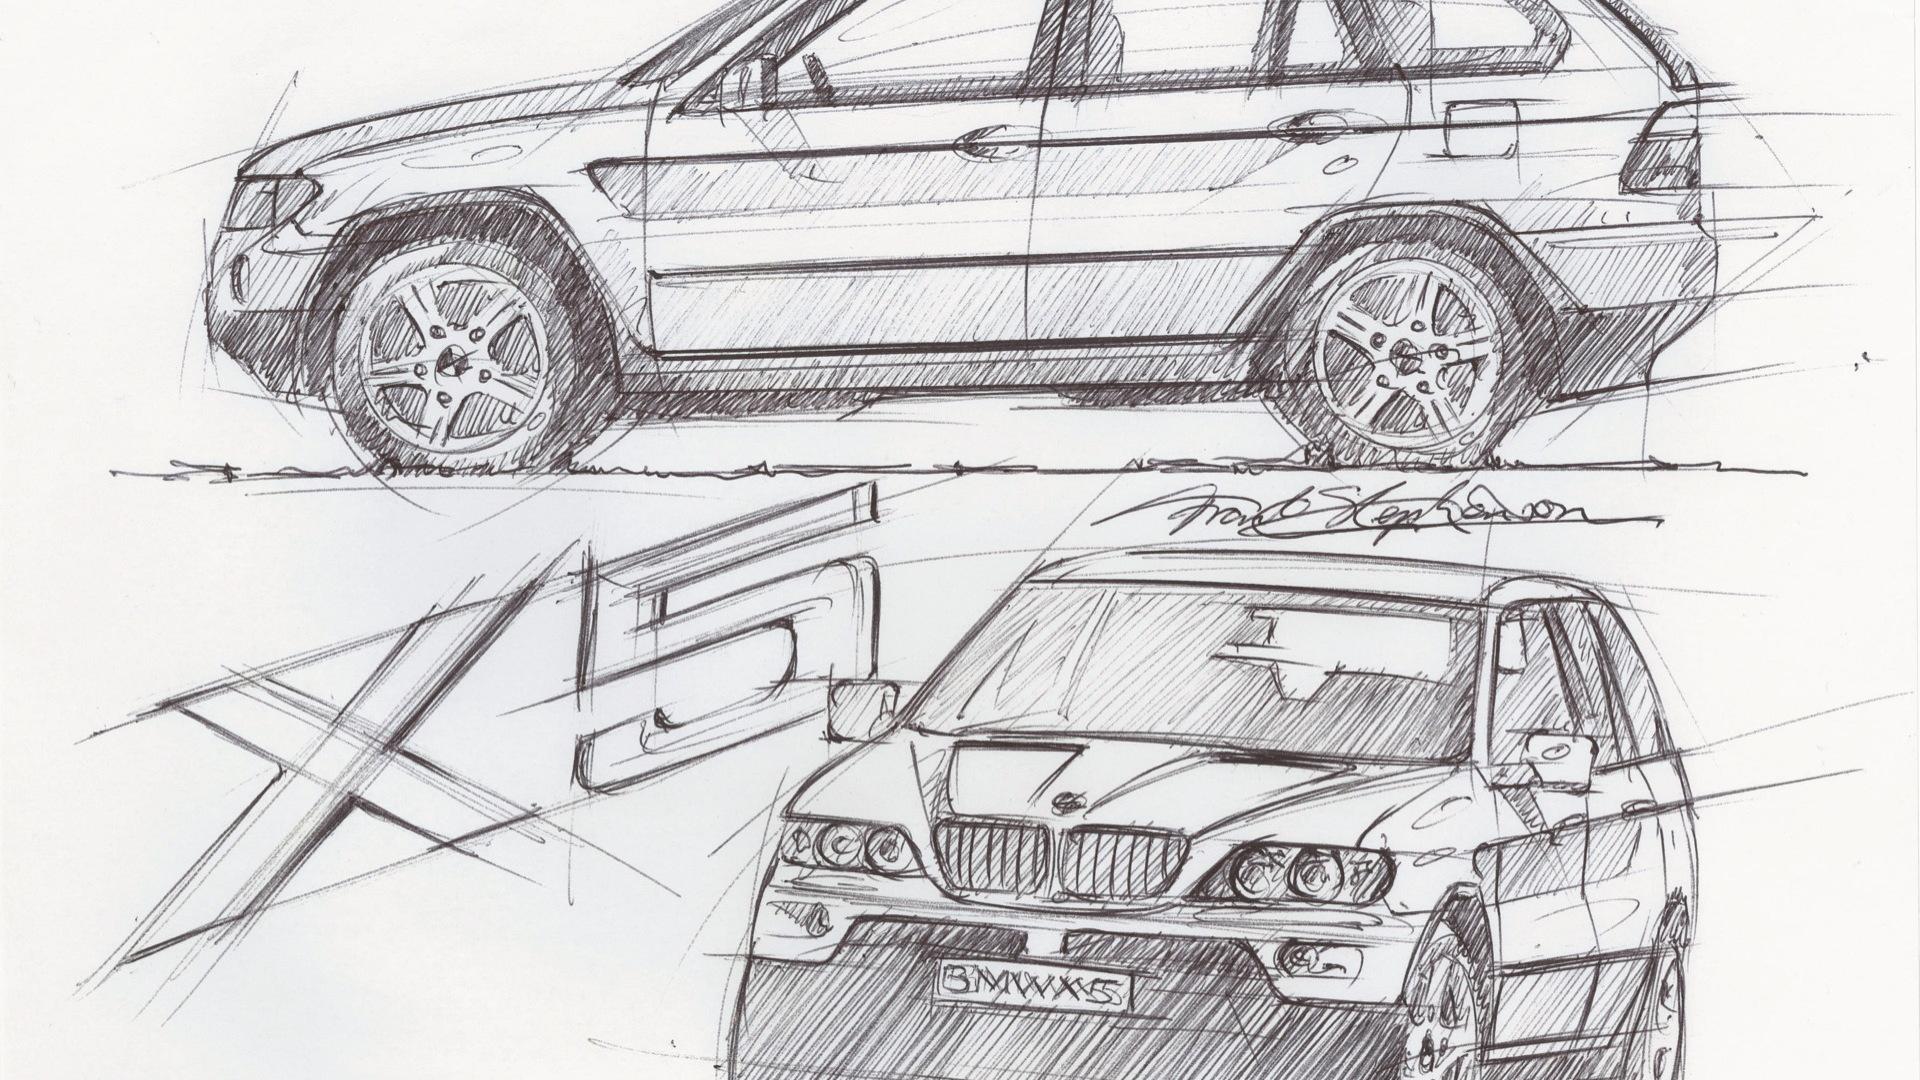 Frank Stephenson BMW X5 sketch